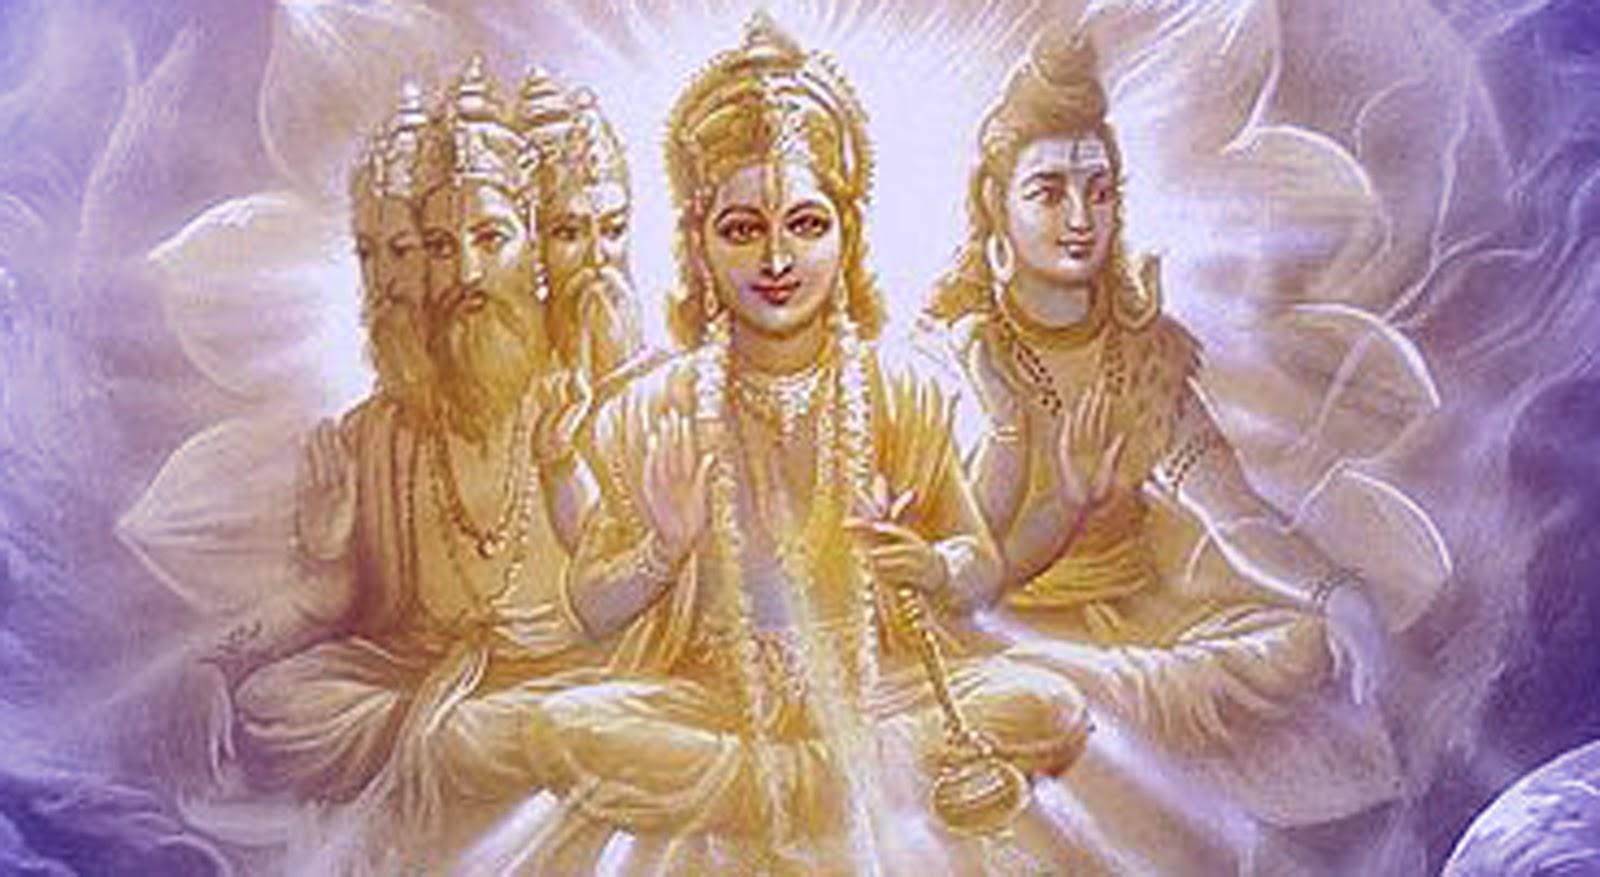 The meaning of upanishads by vishnu to brahma